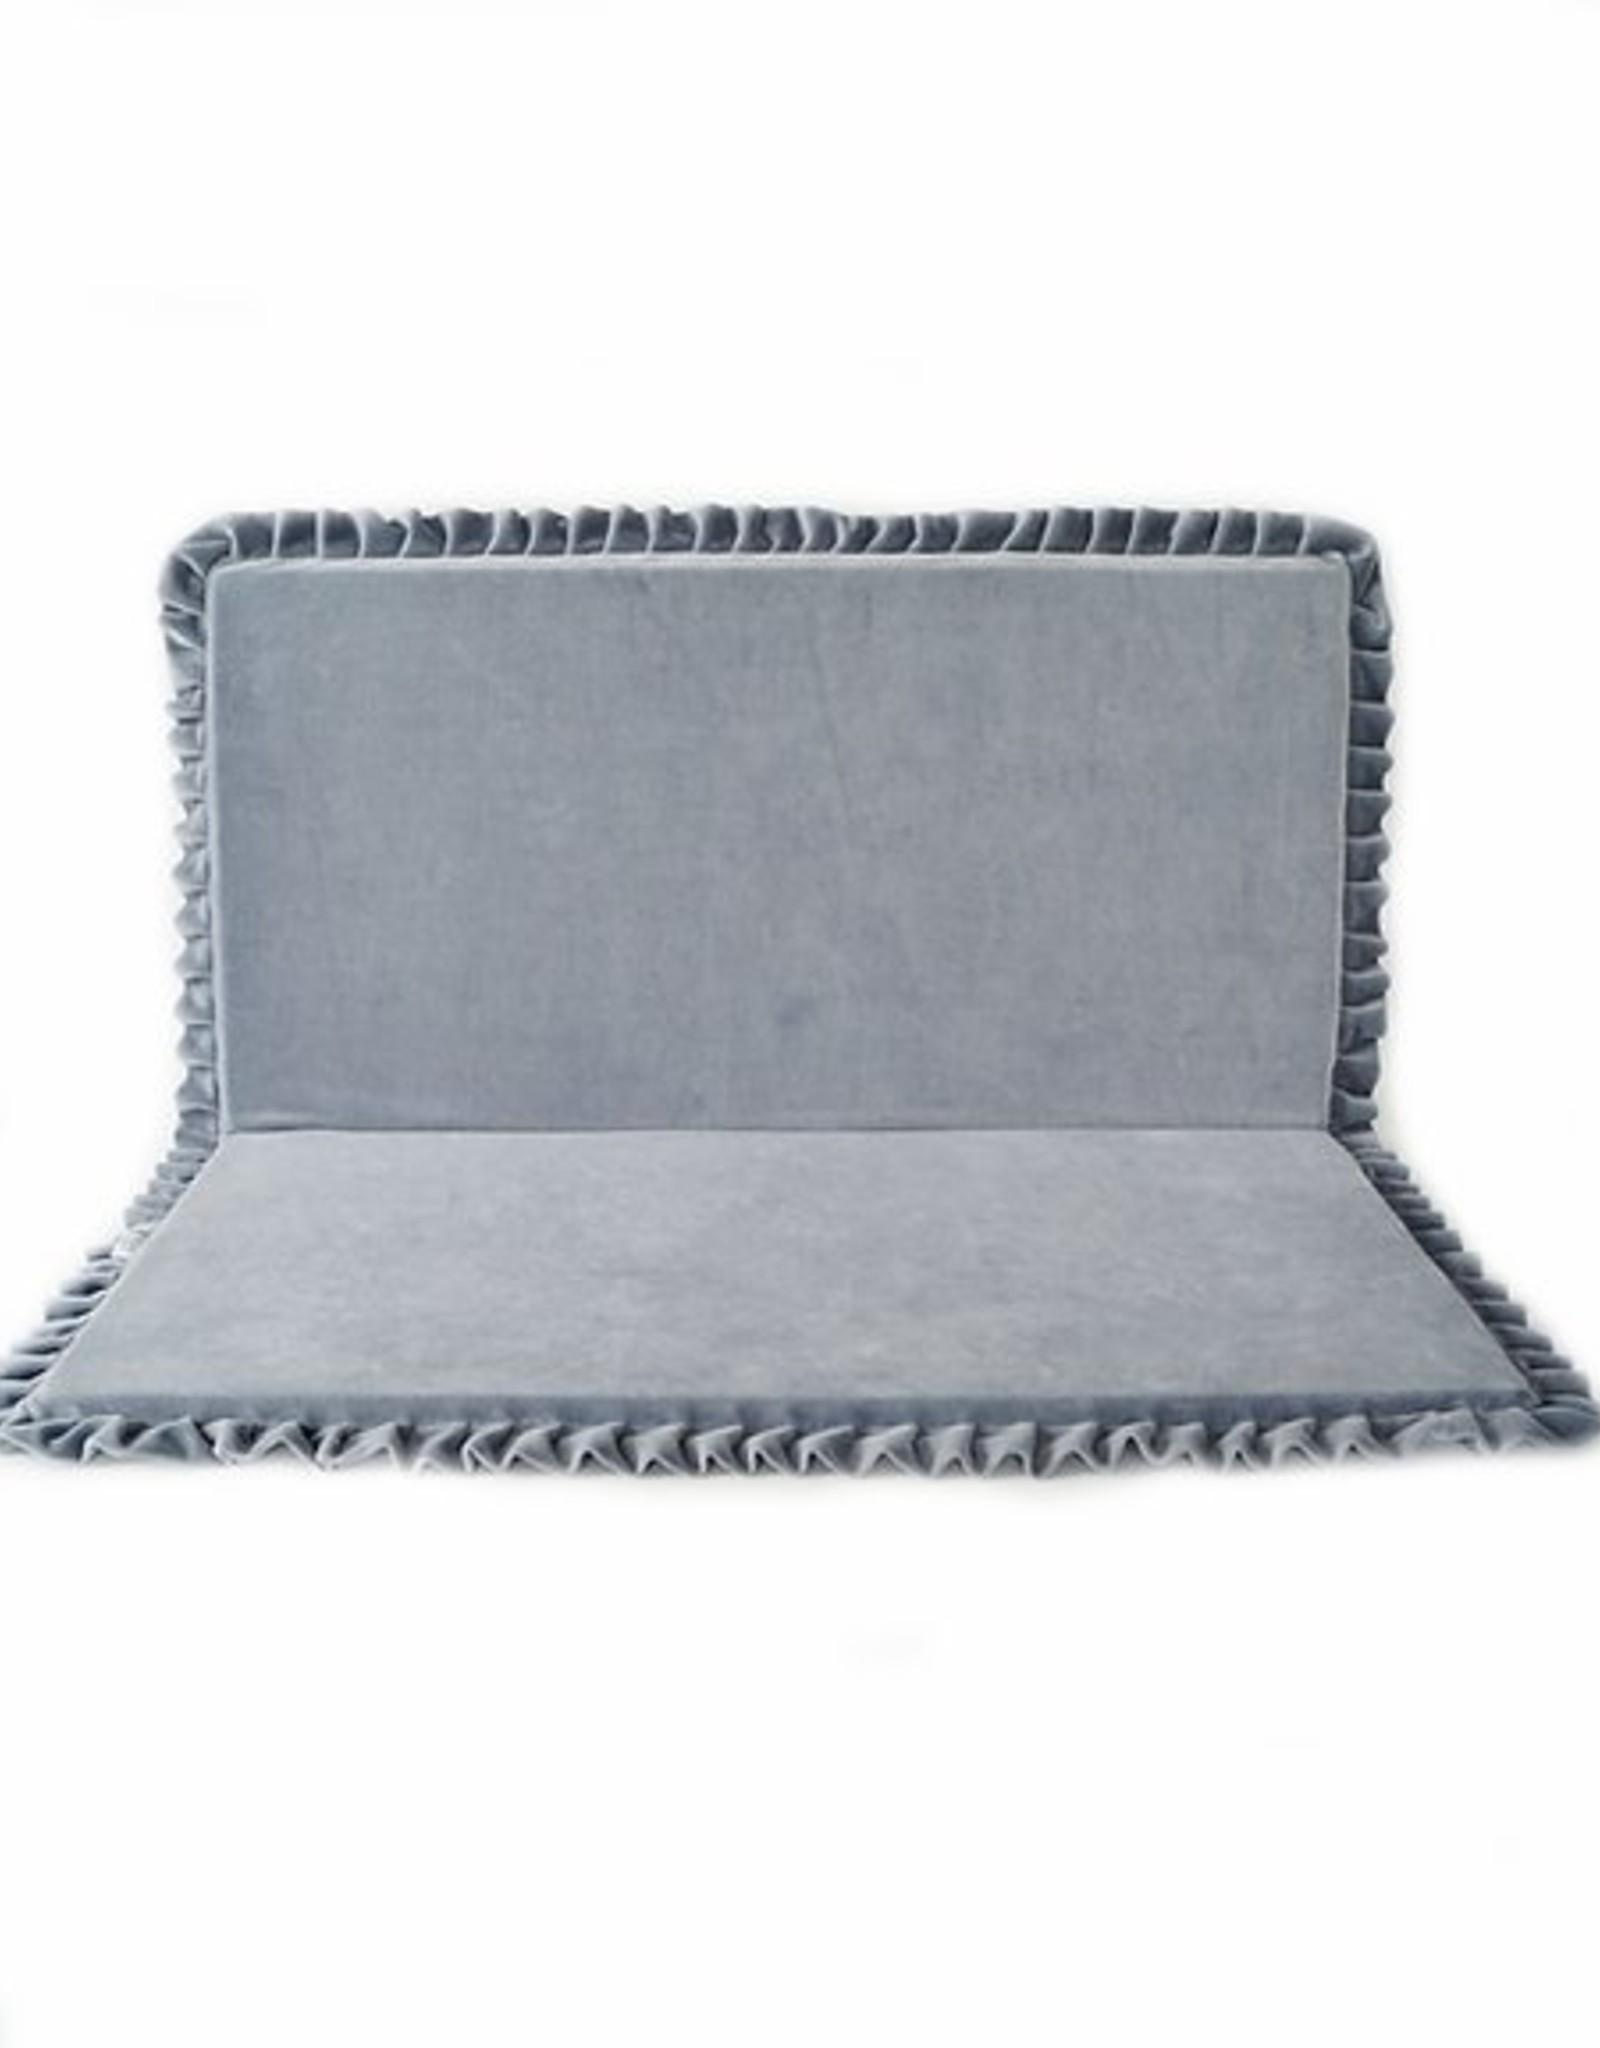 Miii Mi Velvet speelmat Vierkant - grey